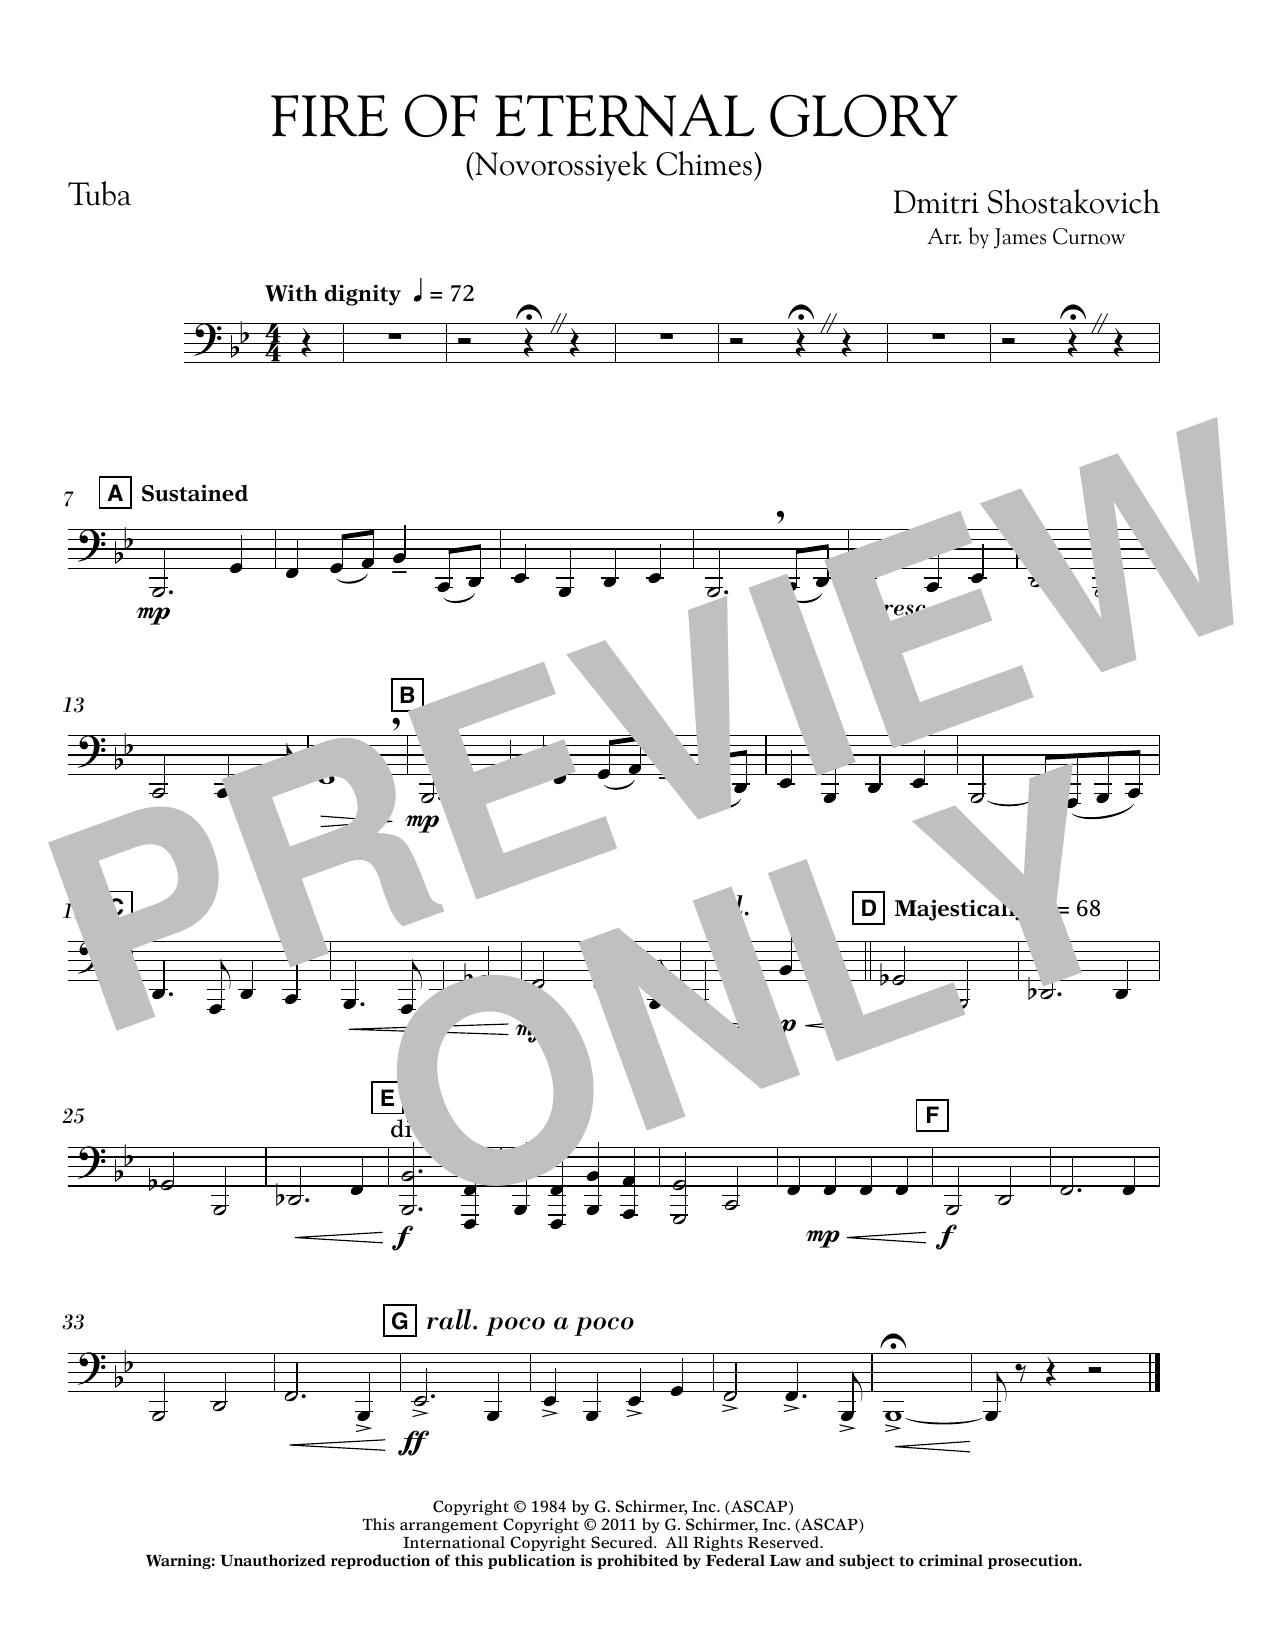 Fire of Eternal Glory (Novorossiyek Chimes) - Tuba (Concert Band)